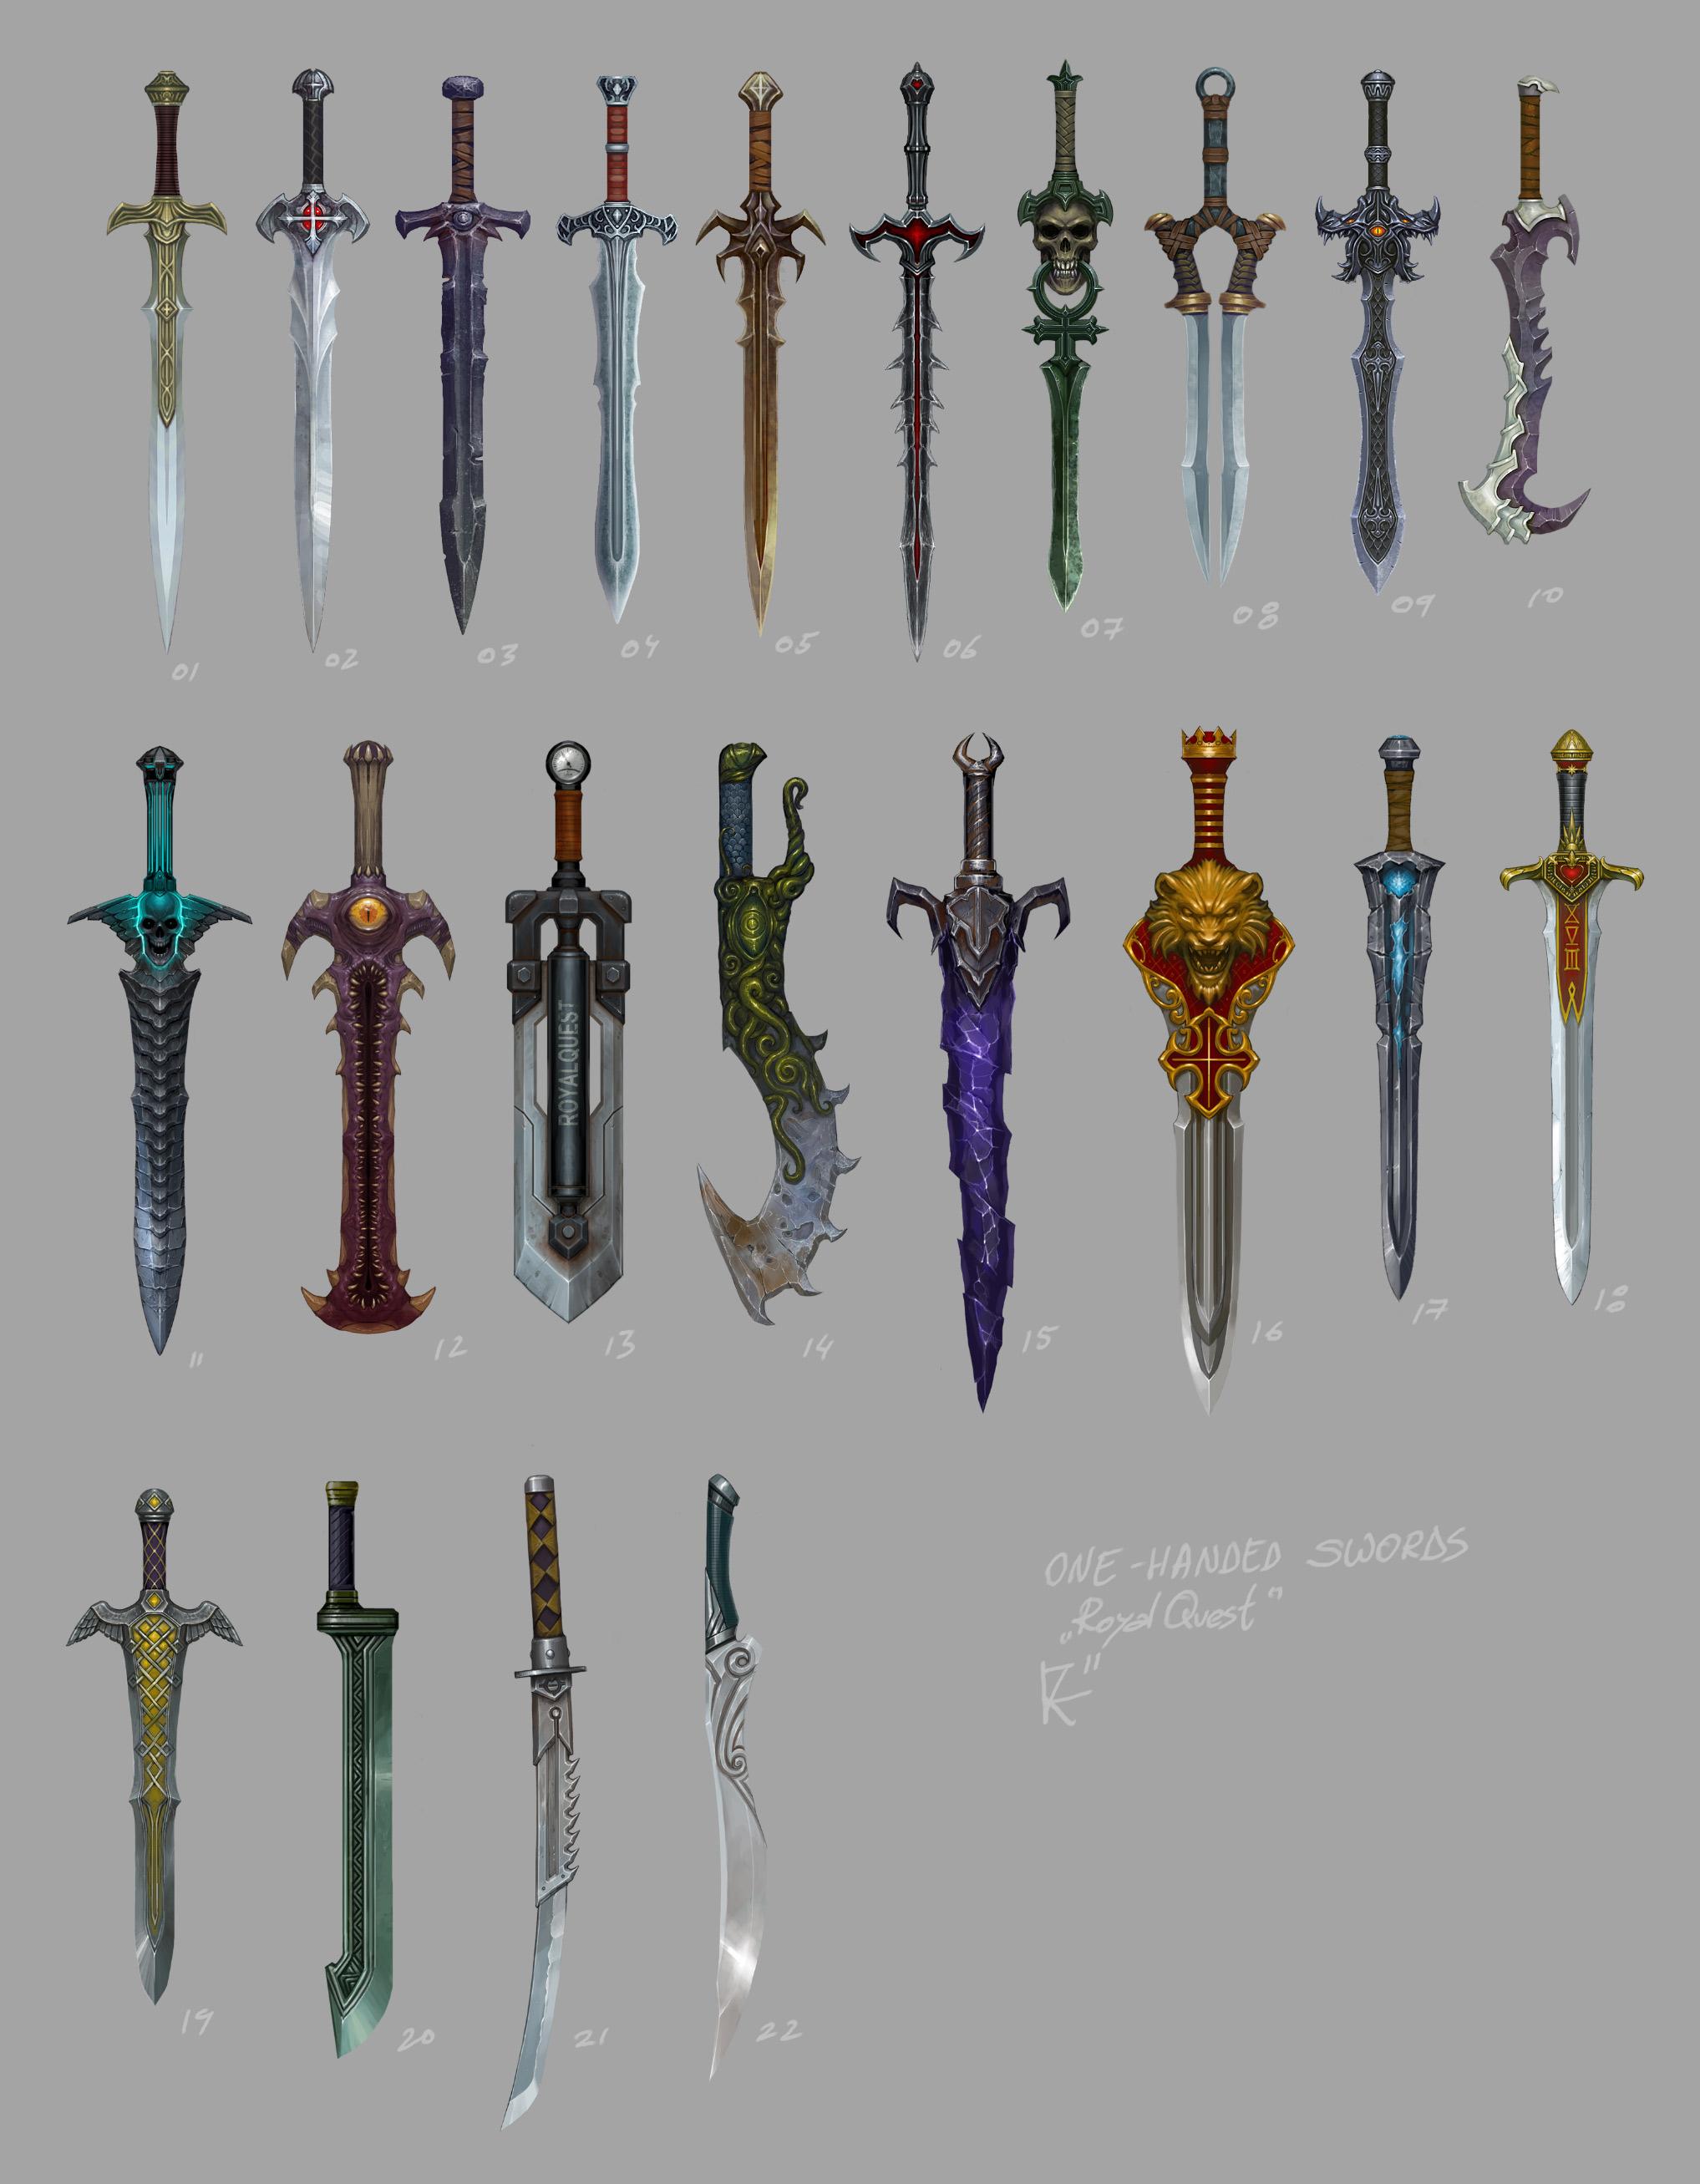 1-handed swords by Kozivara